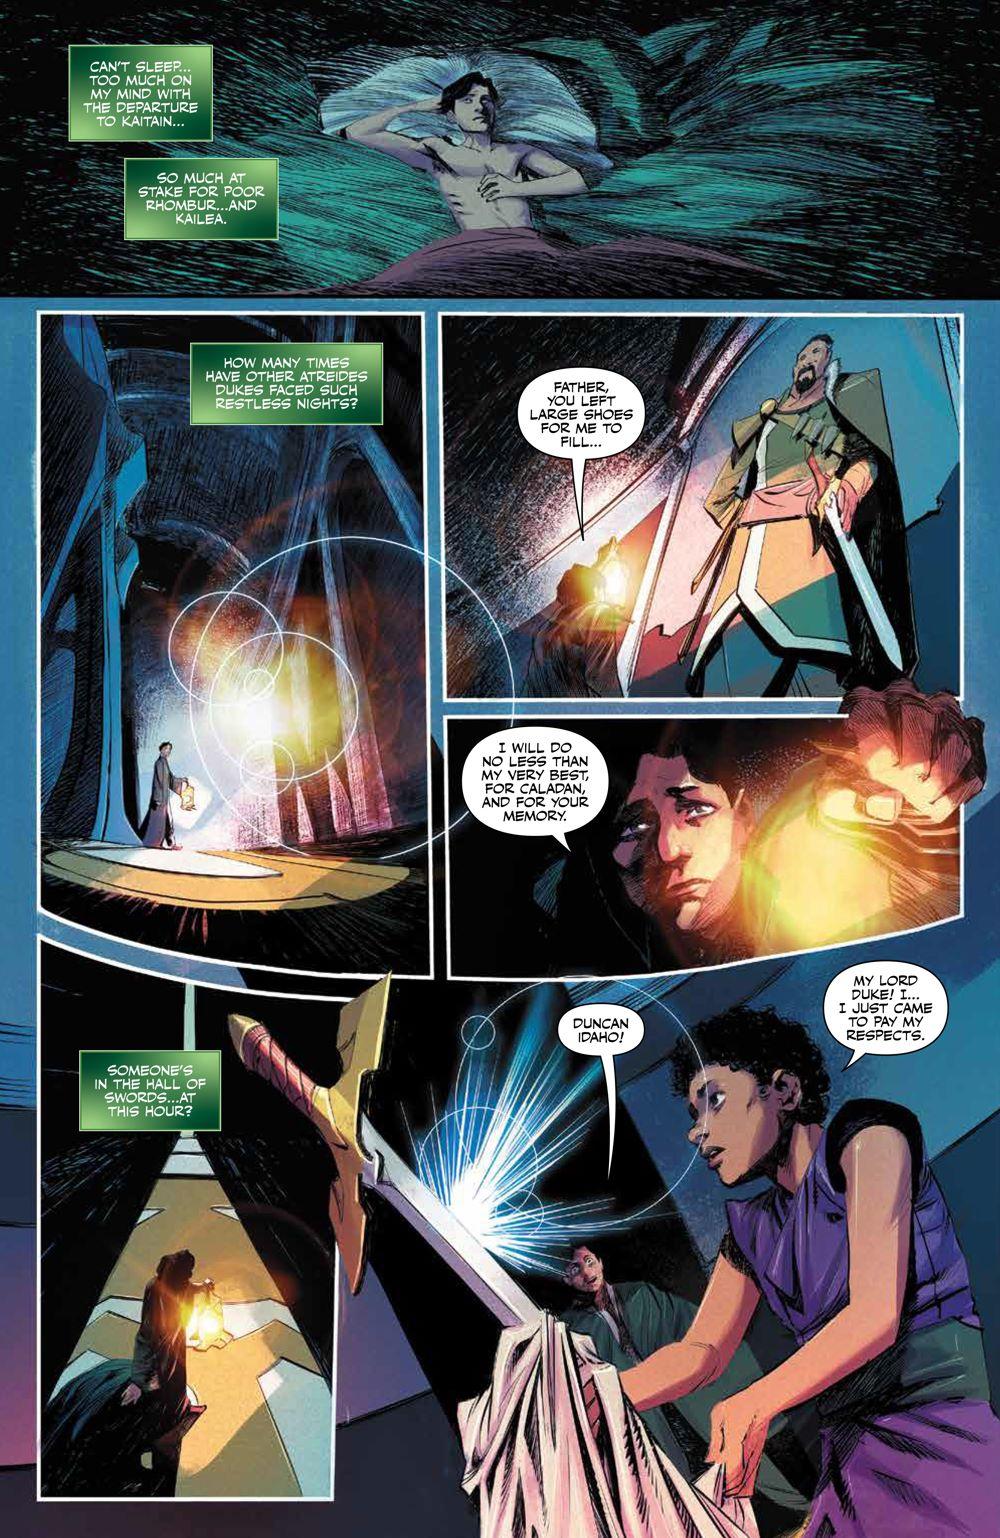 Dune_HouseAtreides_010_PRESS_5 ComicList Previews: DUNE HOUSE ATREIDES #10 (OF 12)